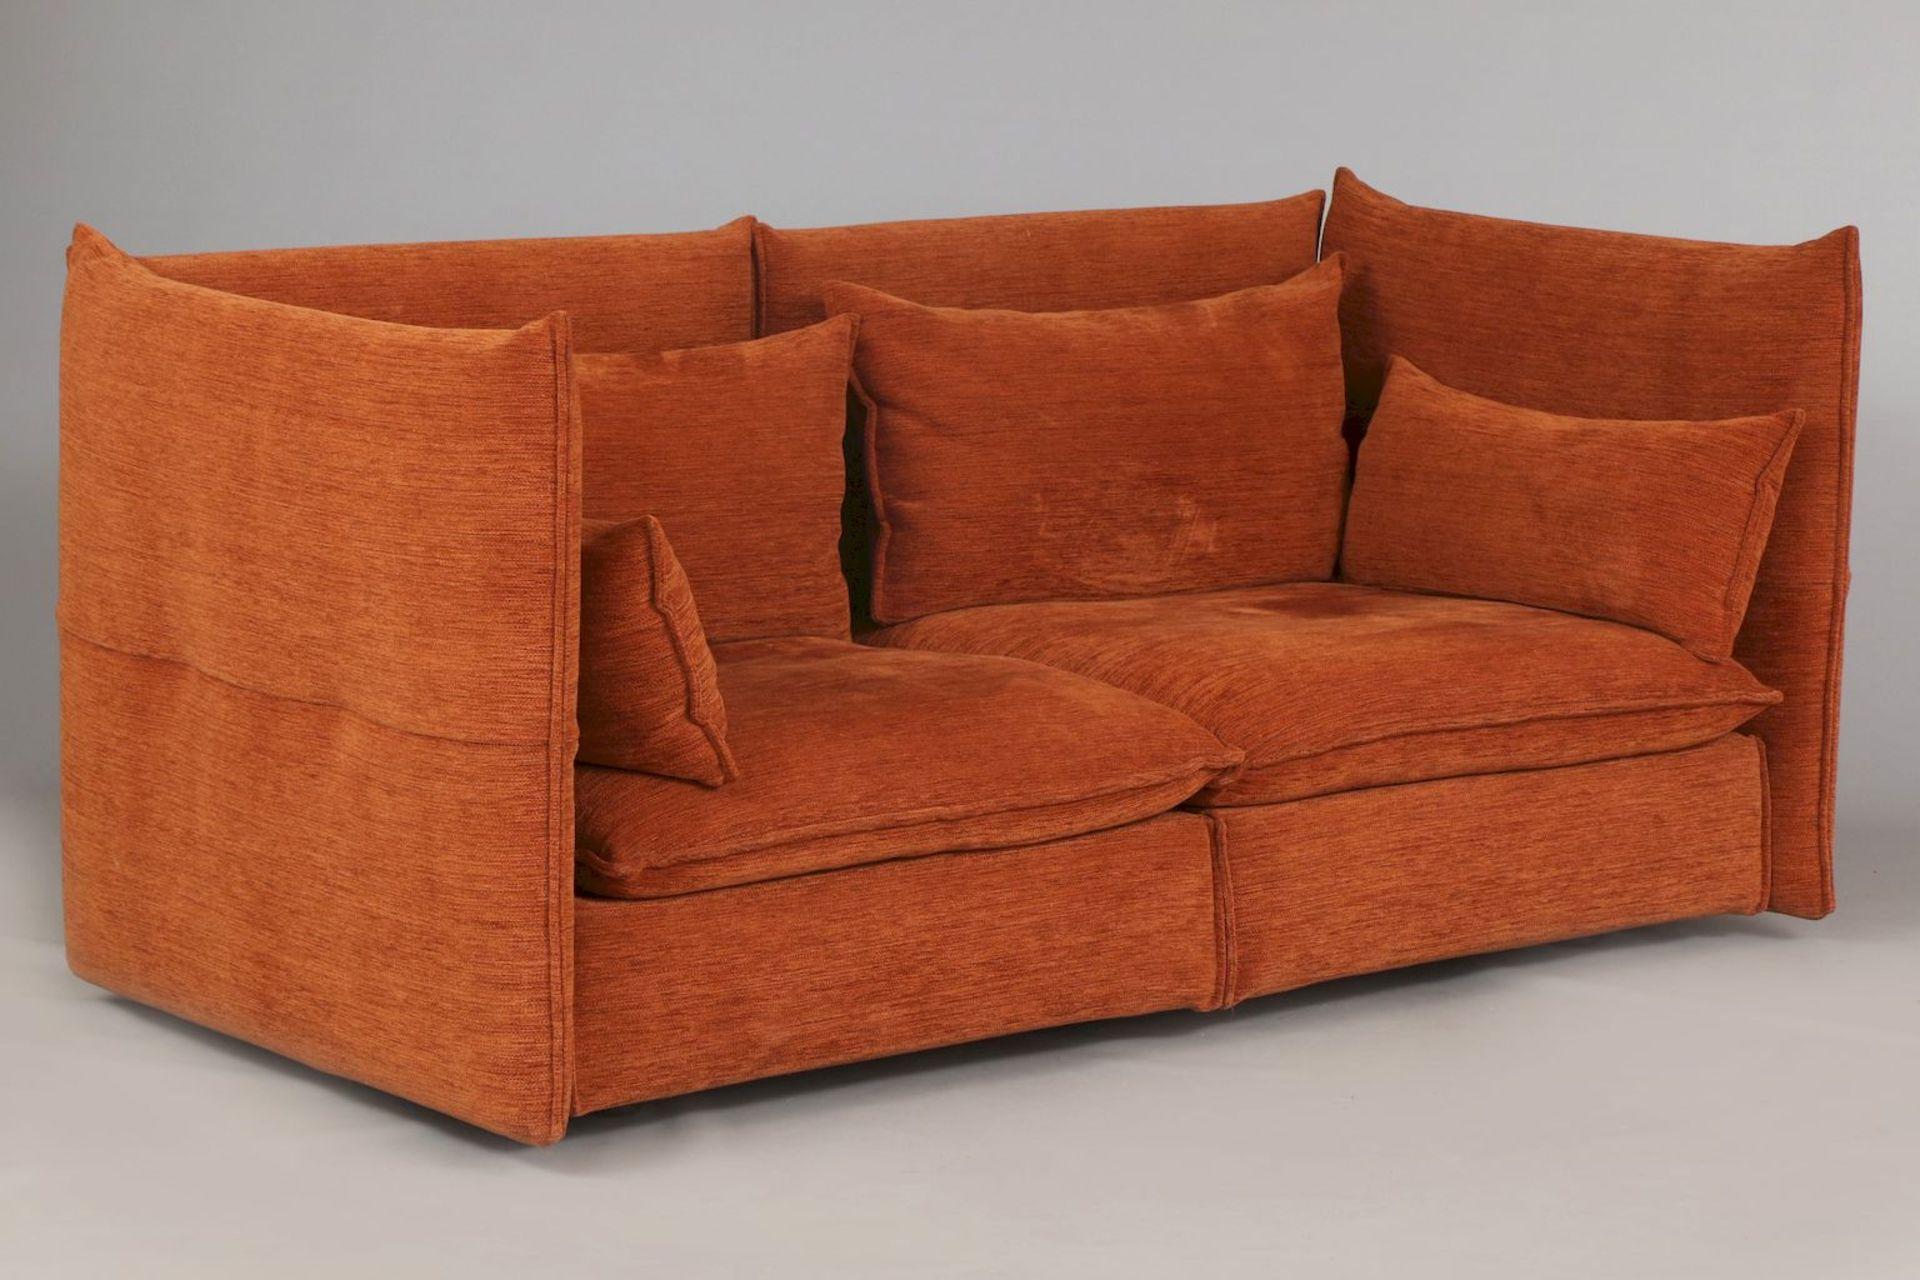 EDWARD BARBER & JAY OSGERBY Sofa ¨Mariposa¨ (2014) - Image 2 of 6